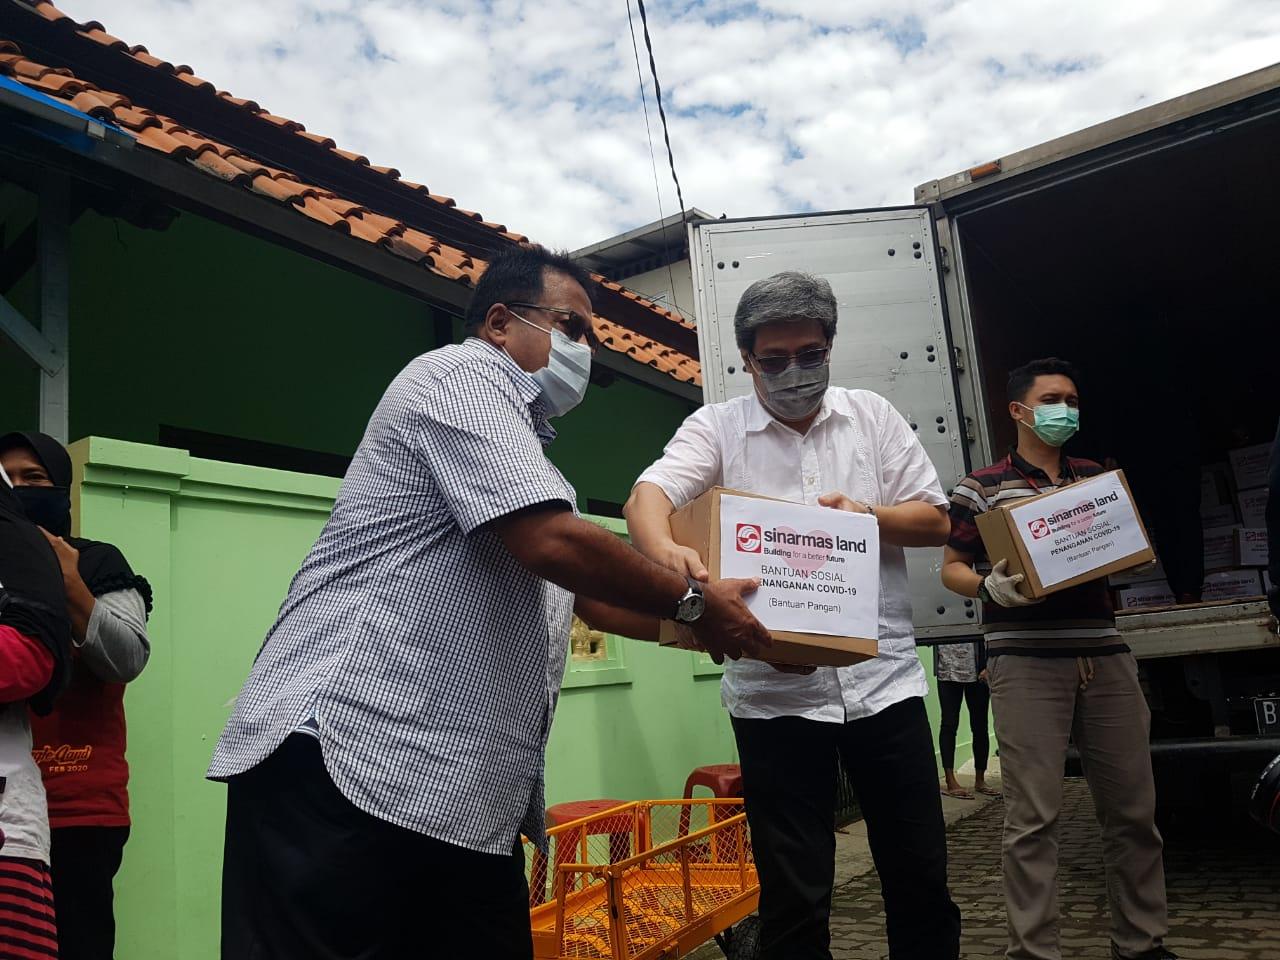 Managing Director President Office Sinar Mas Land, Dhony Rahajoe bersama Rano Karno menyerahkah satu paket sembako kepada warga Cipondoh yang terdampak Covid-19, Kota Tangerang, Kamis (21/5/2020).